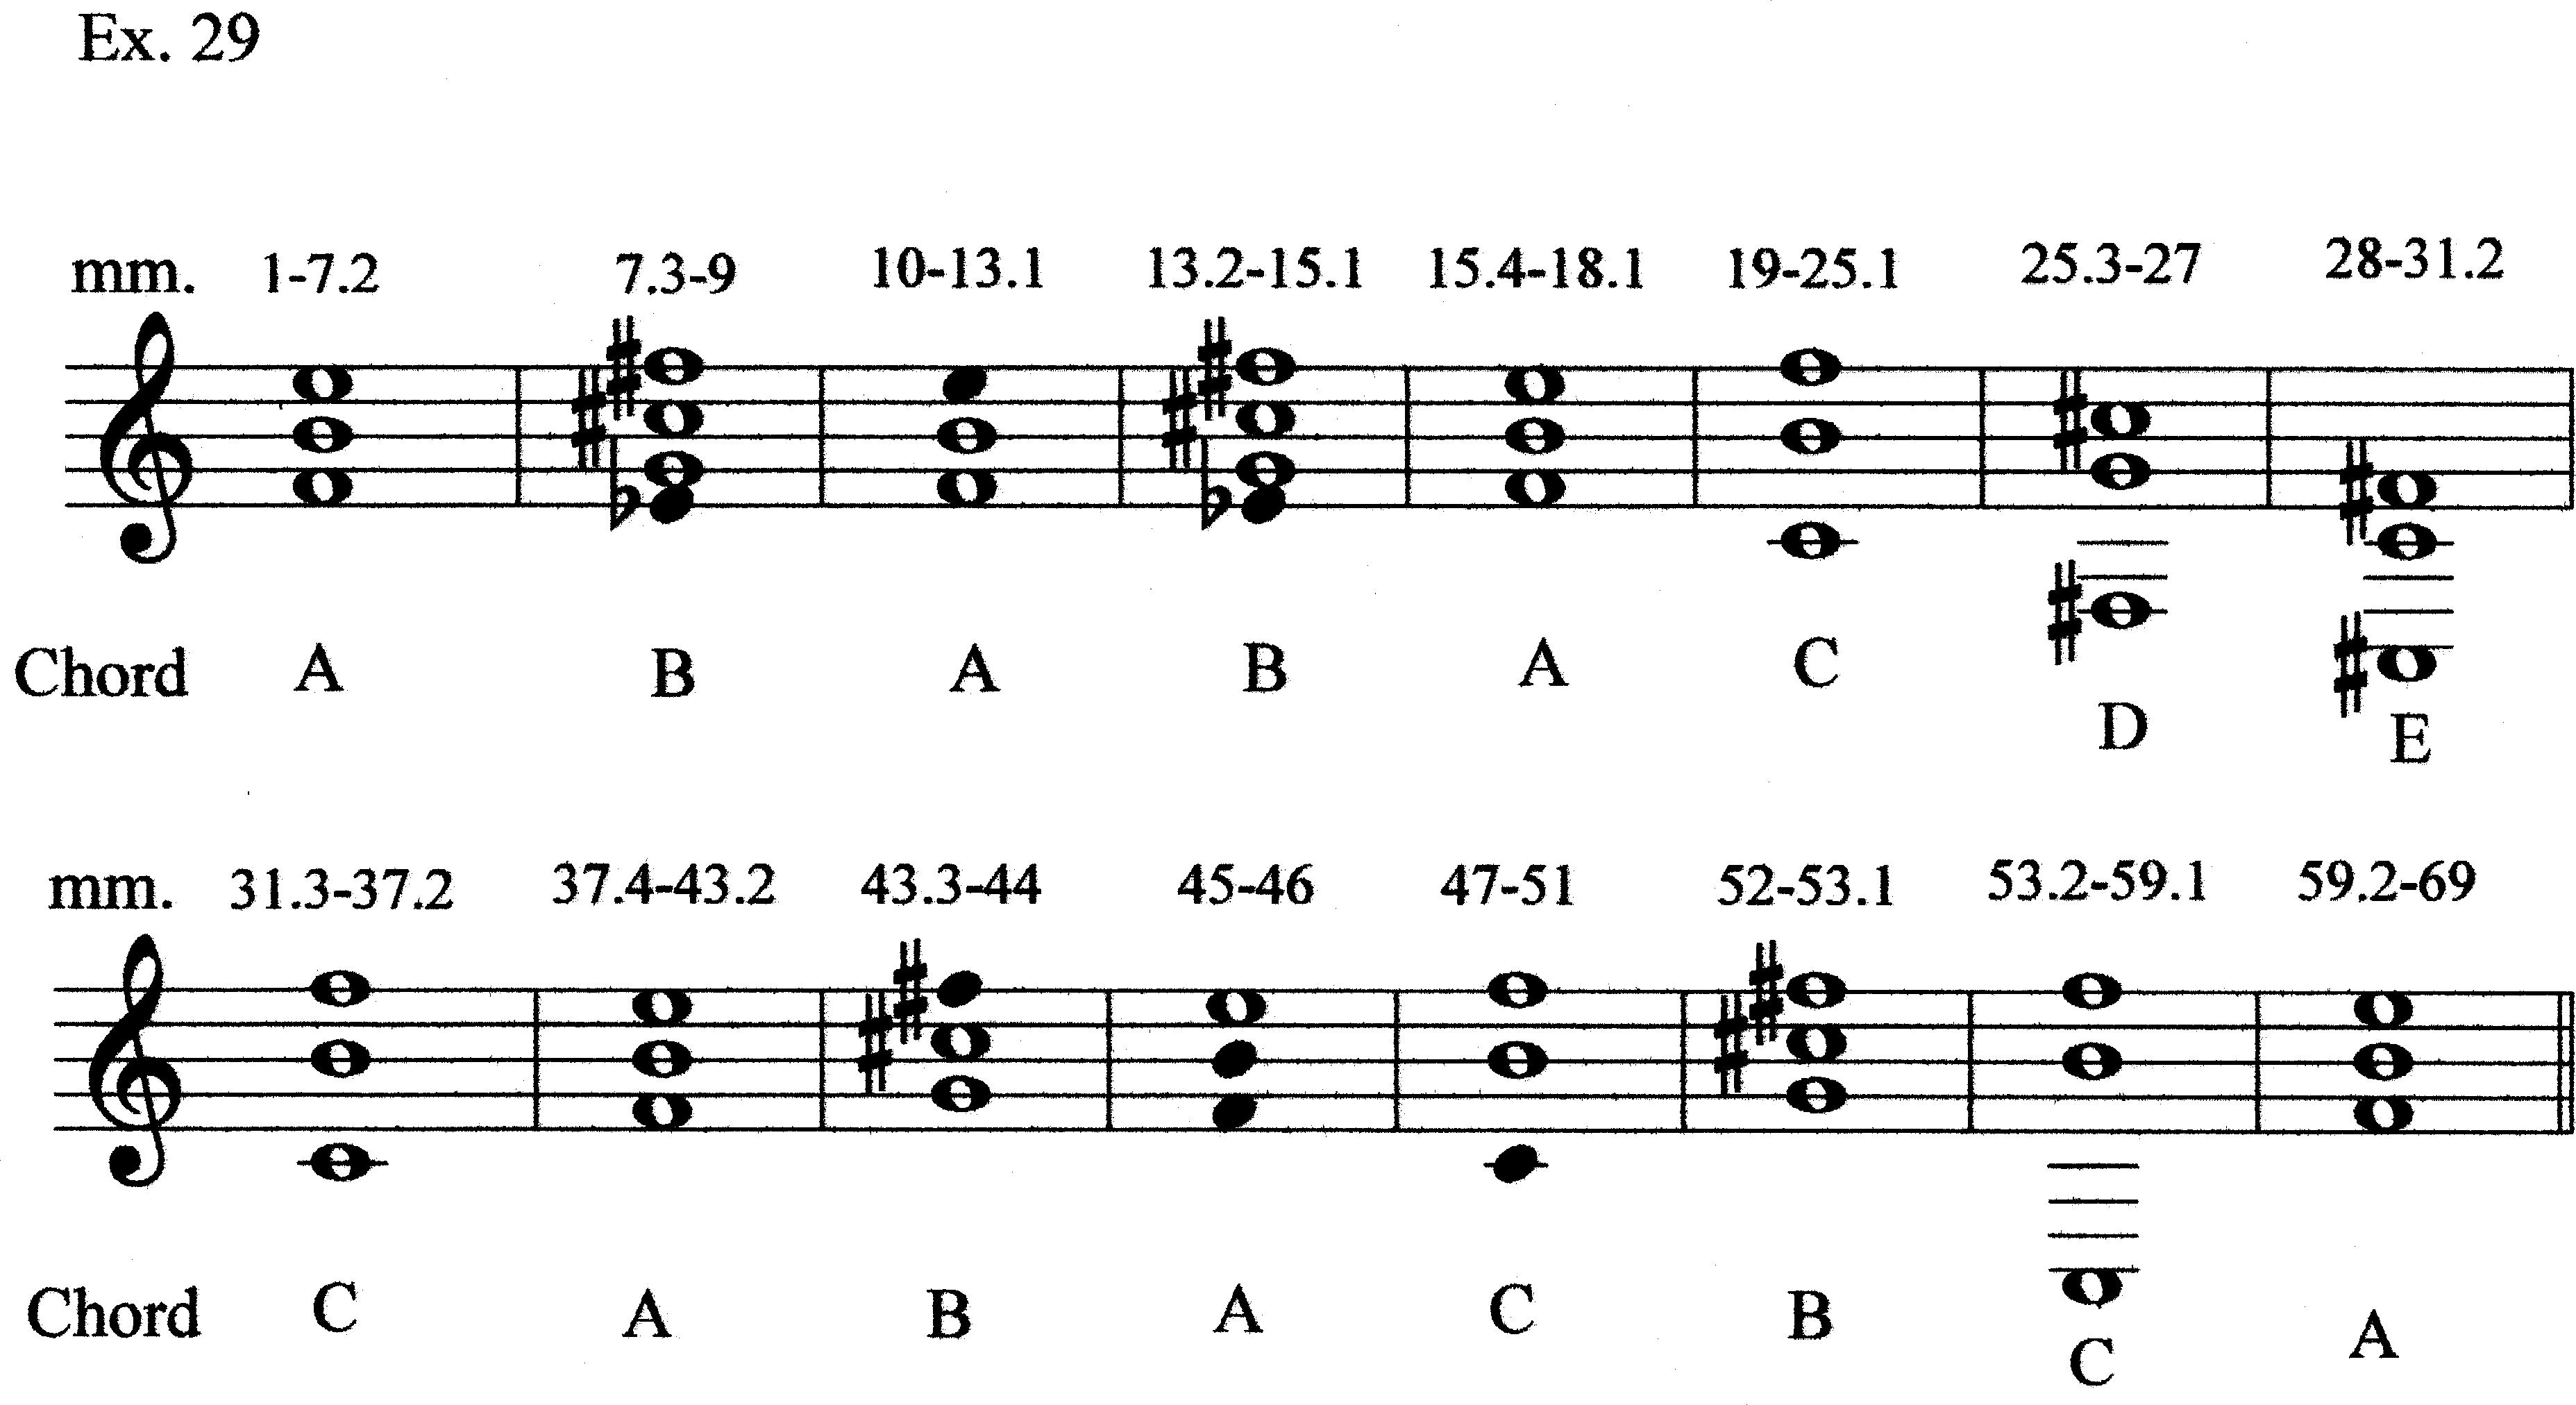 Stm online vol 10 2007 stephen harper registral streams 321 chord regions and prolongation hexwebz Choice Image